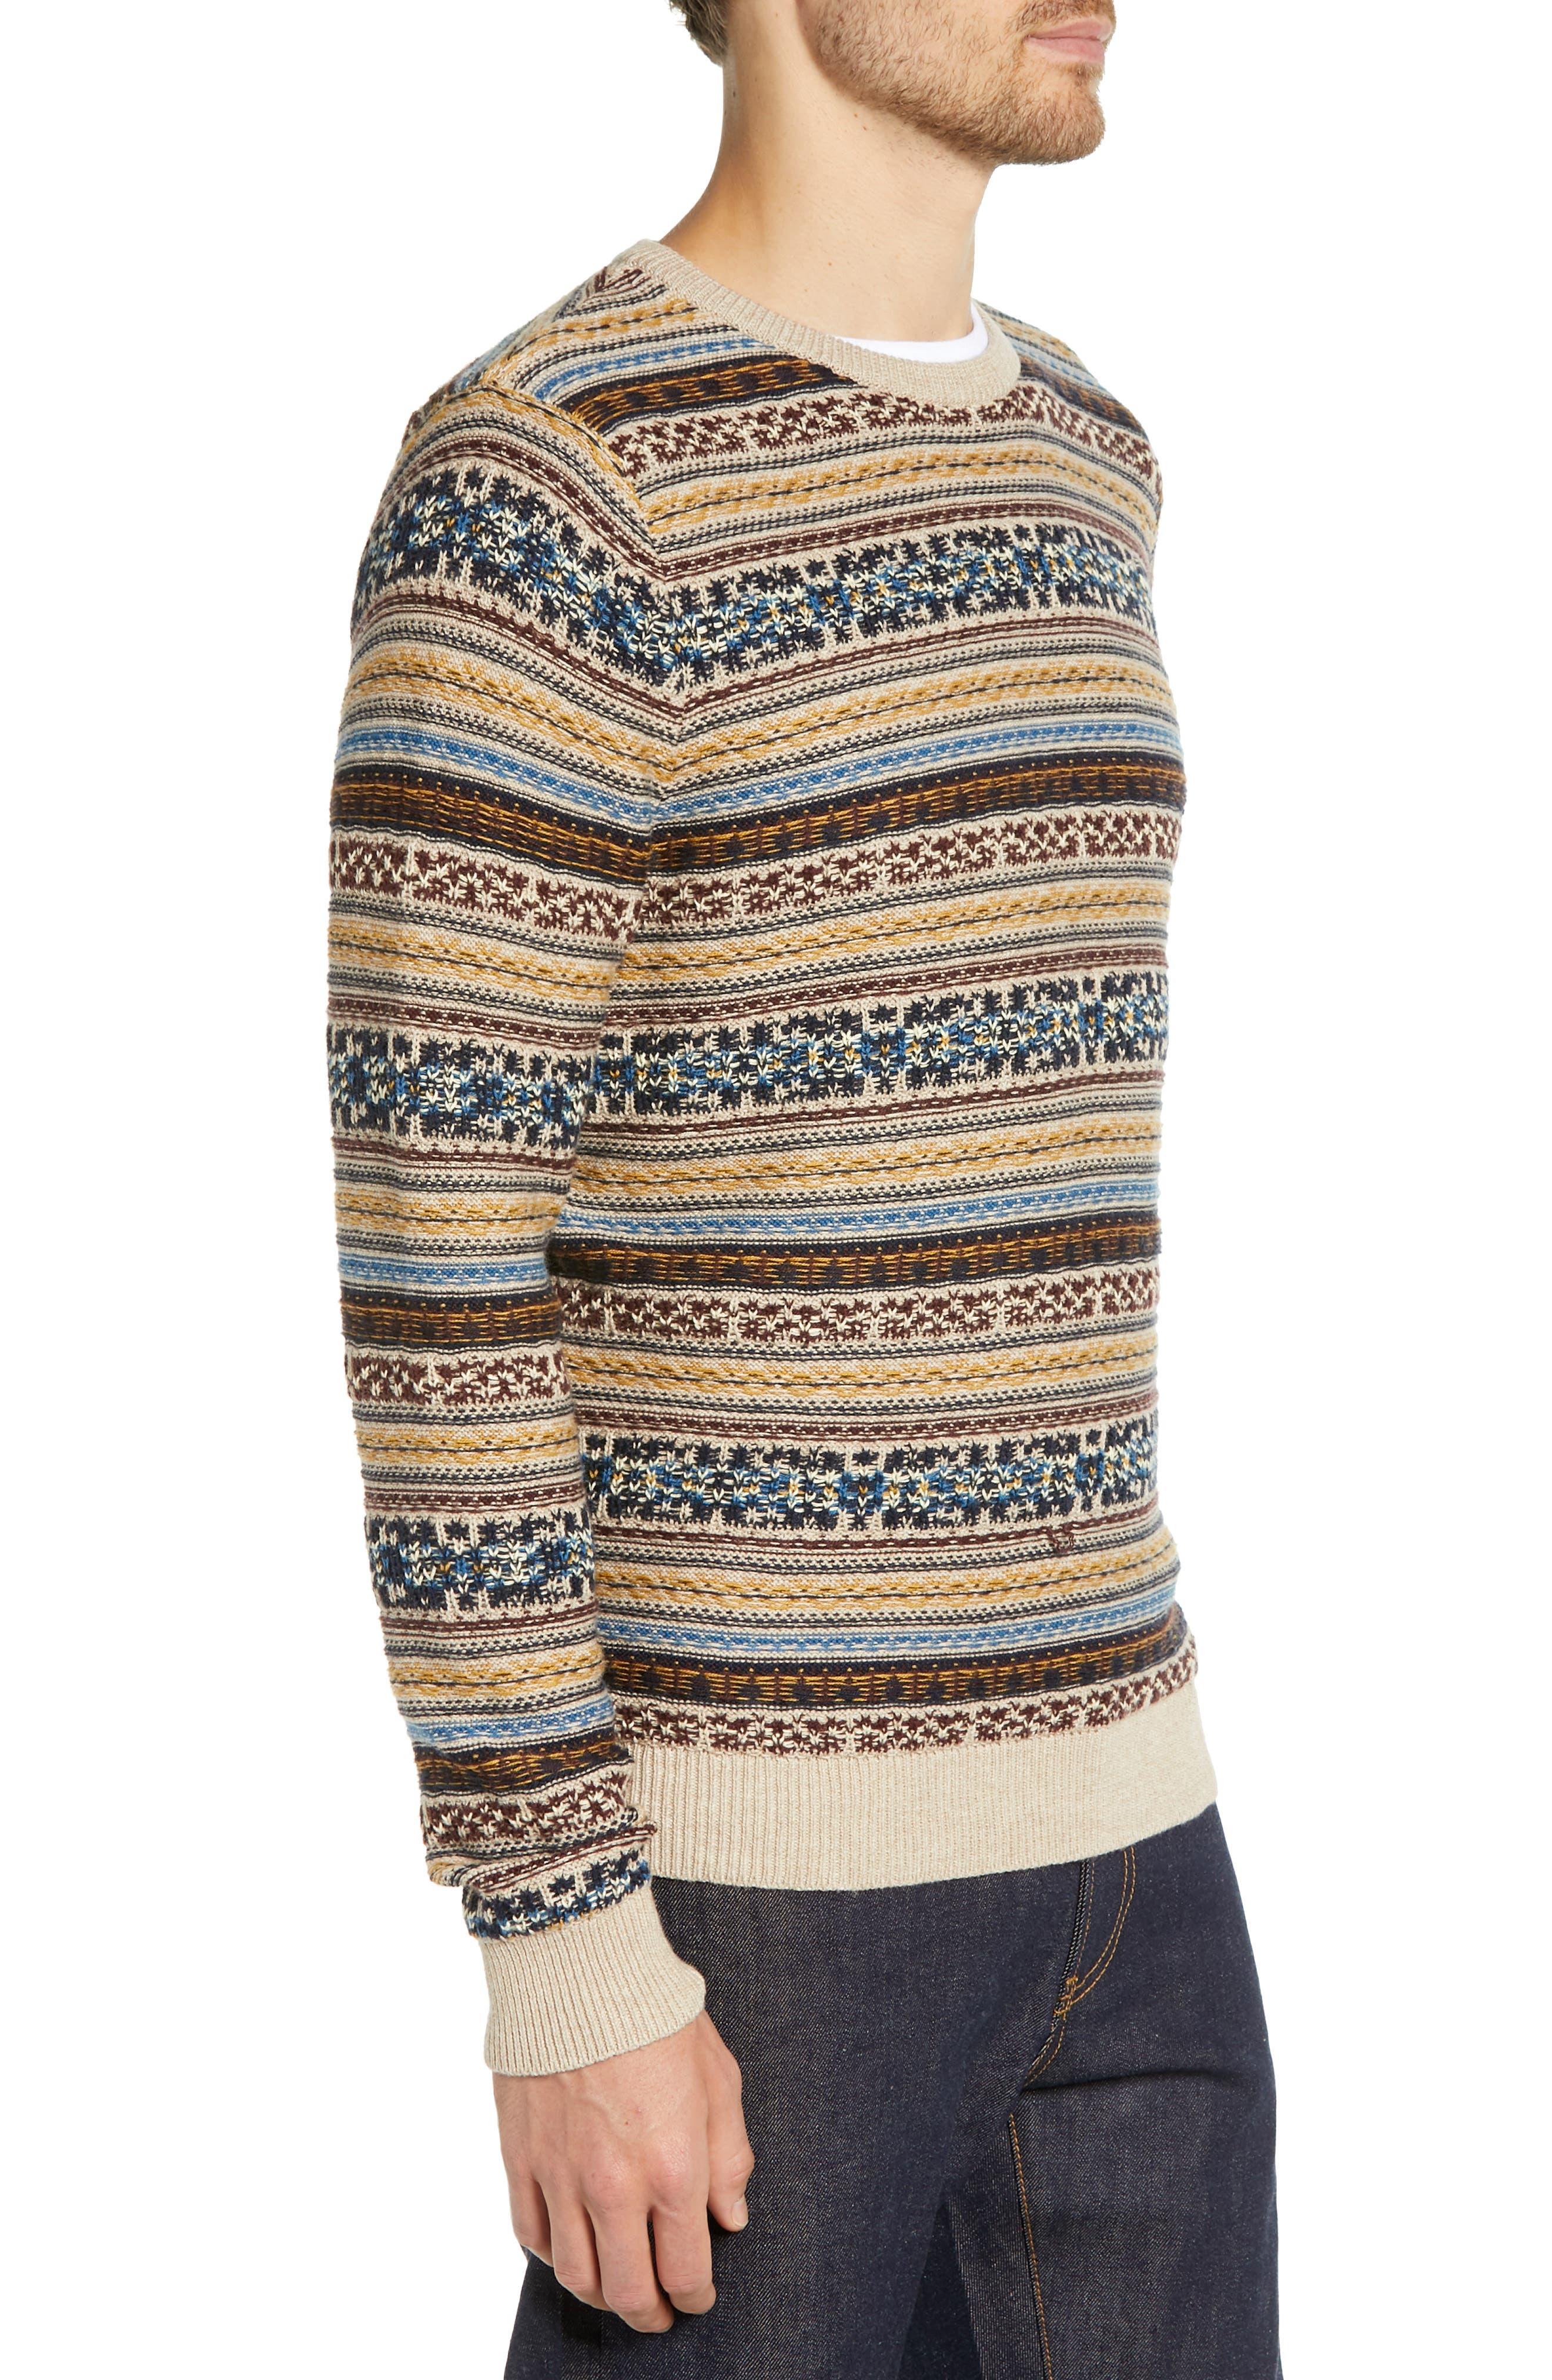 Regular Fit Fair Isle Crewneck Sweater,                             Alternate thumbnail 3, color,                             BROWN SIENA FAIRISLE